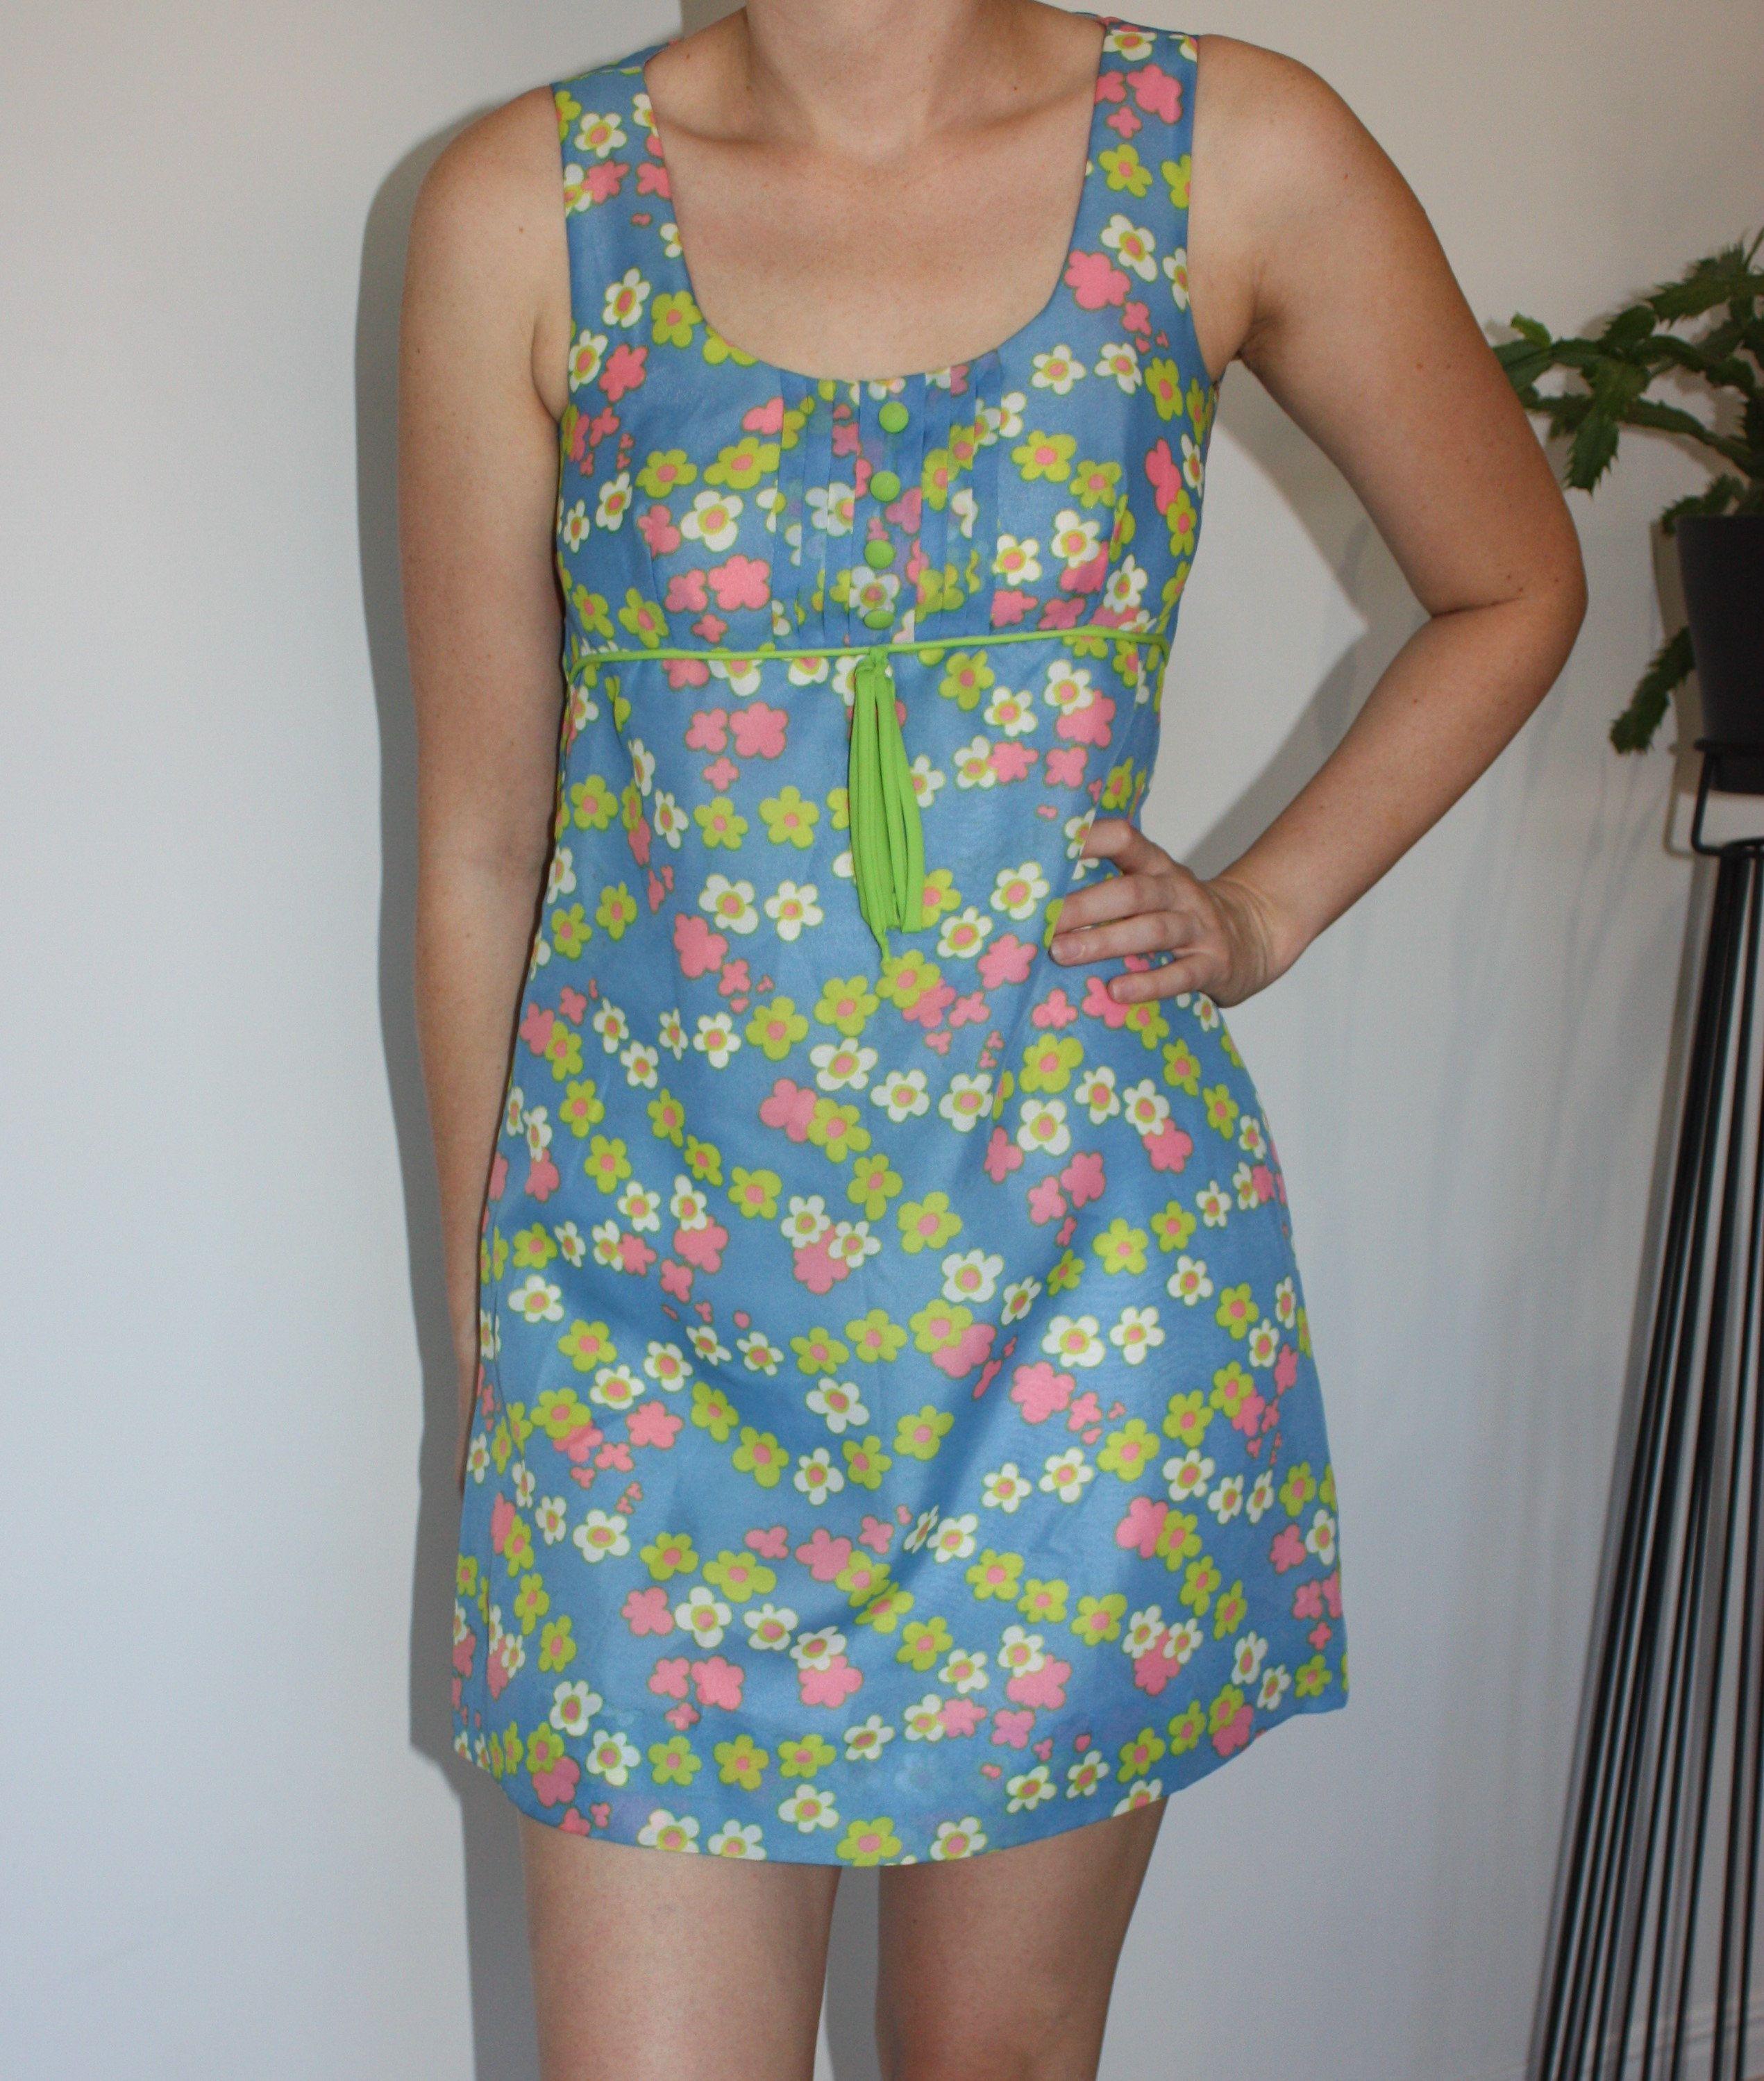 Vintage 60s Dress Retro Mini Dress Floral 60s Shift Dress Women S Size S Vintage Shift Dress Vintage Dress 60s Womens Shift Dresses Vintage Shift Dress [ 2997 x 2541 Pixel ]